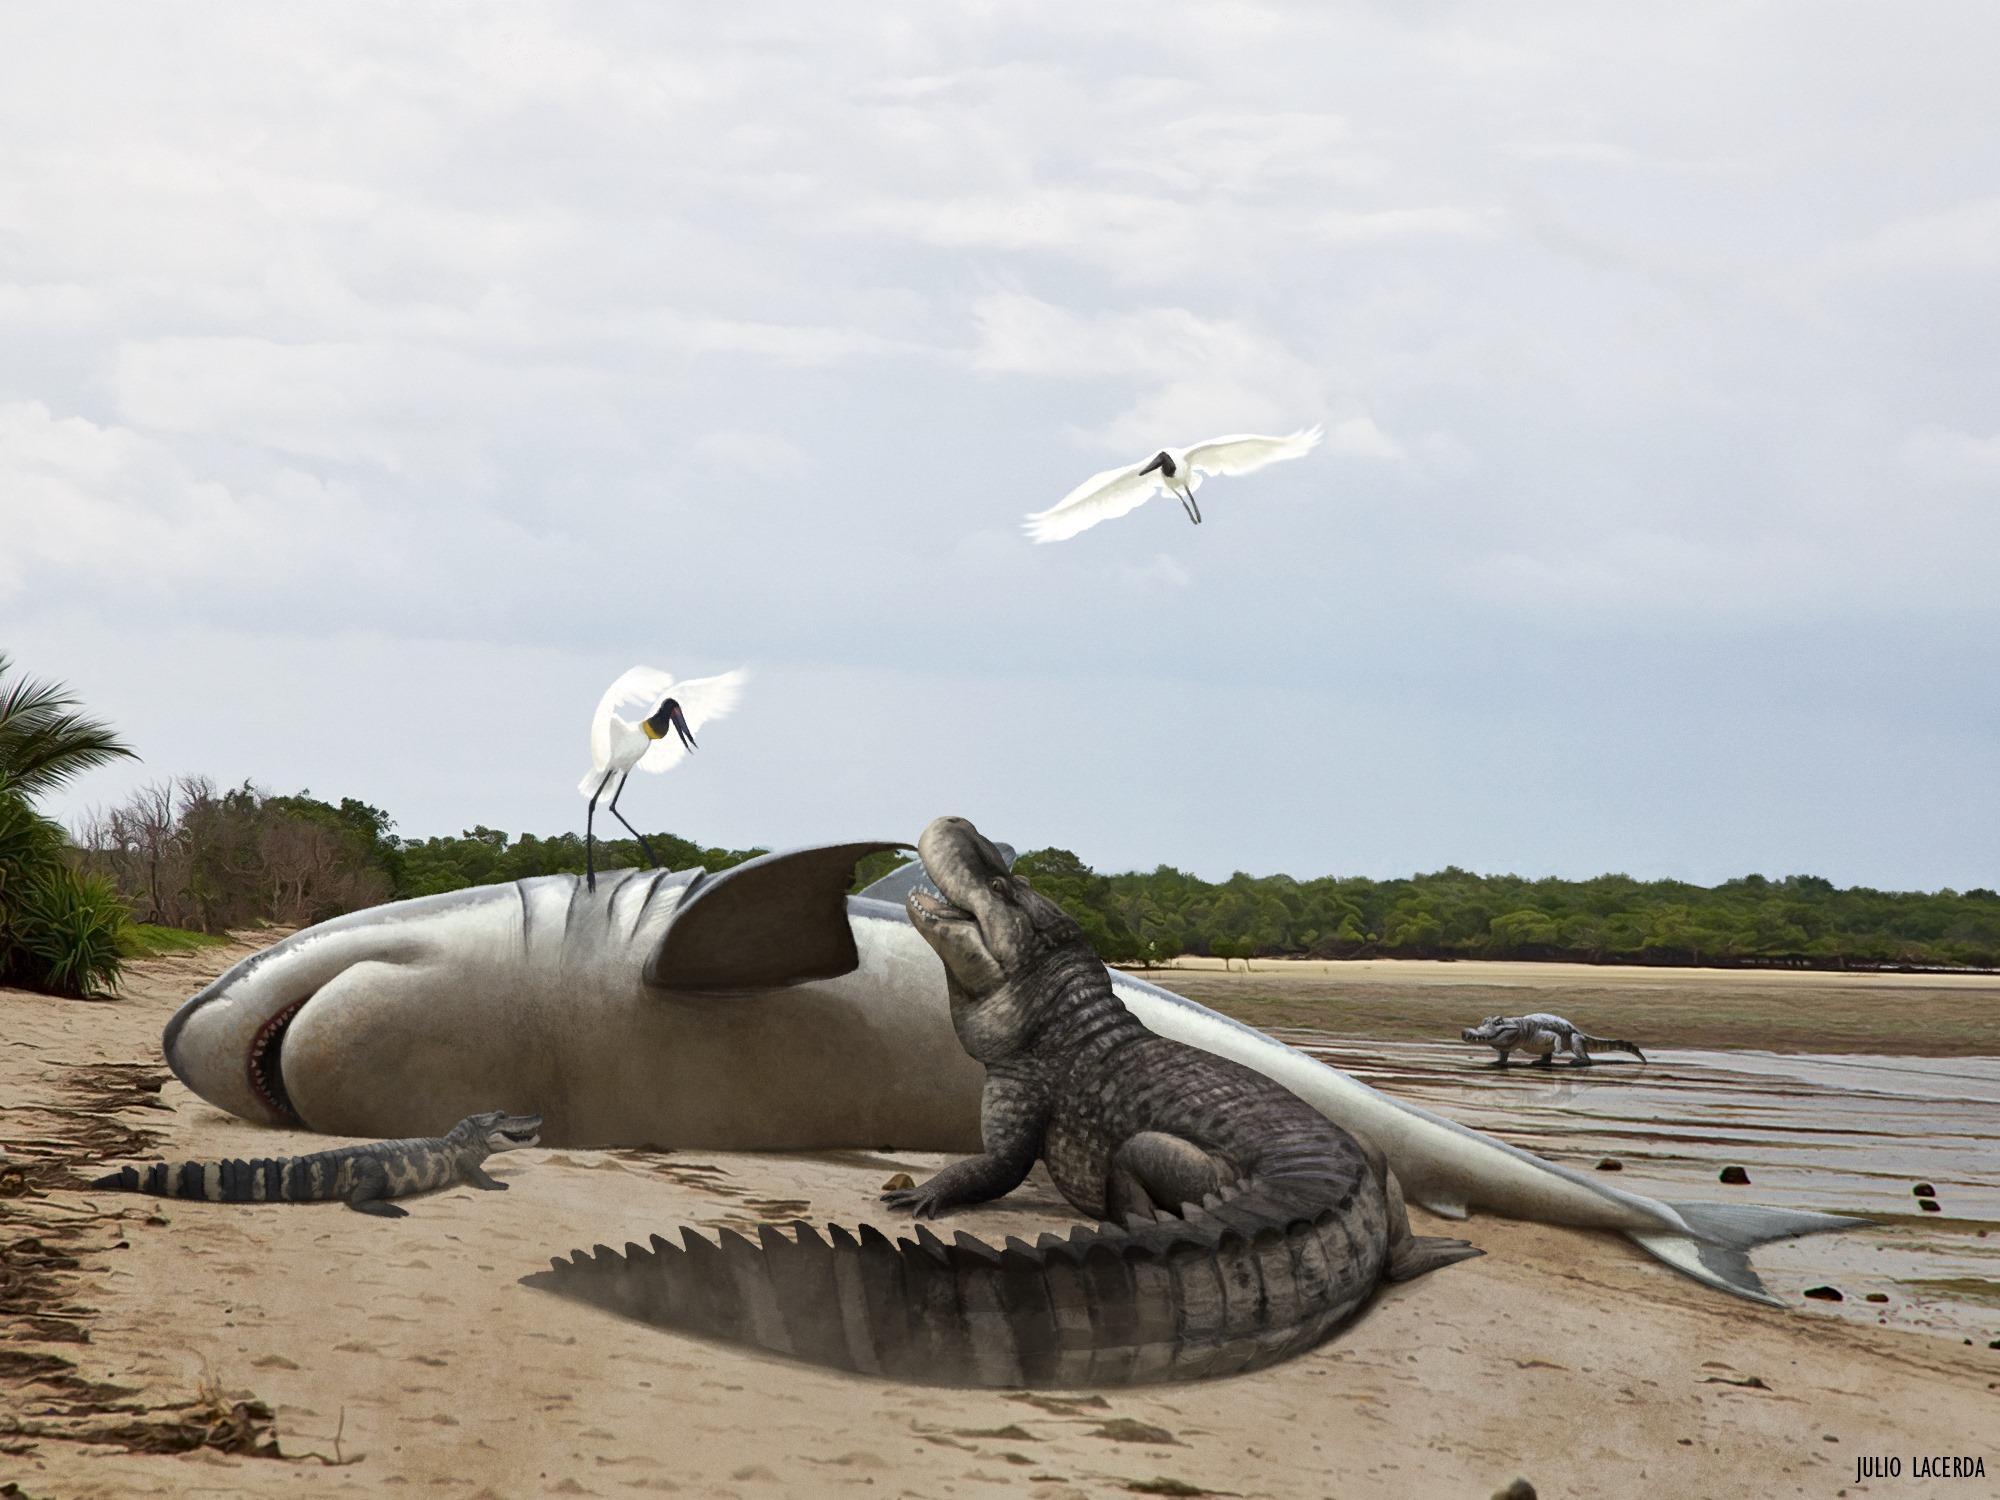 purussaurus_megalodon_julio_lacerda.jpg